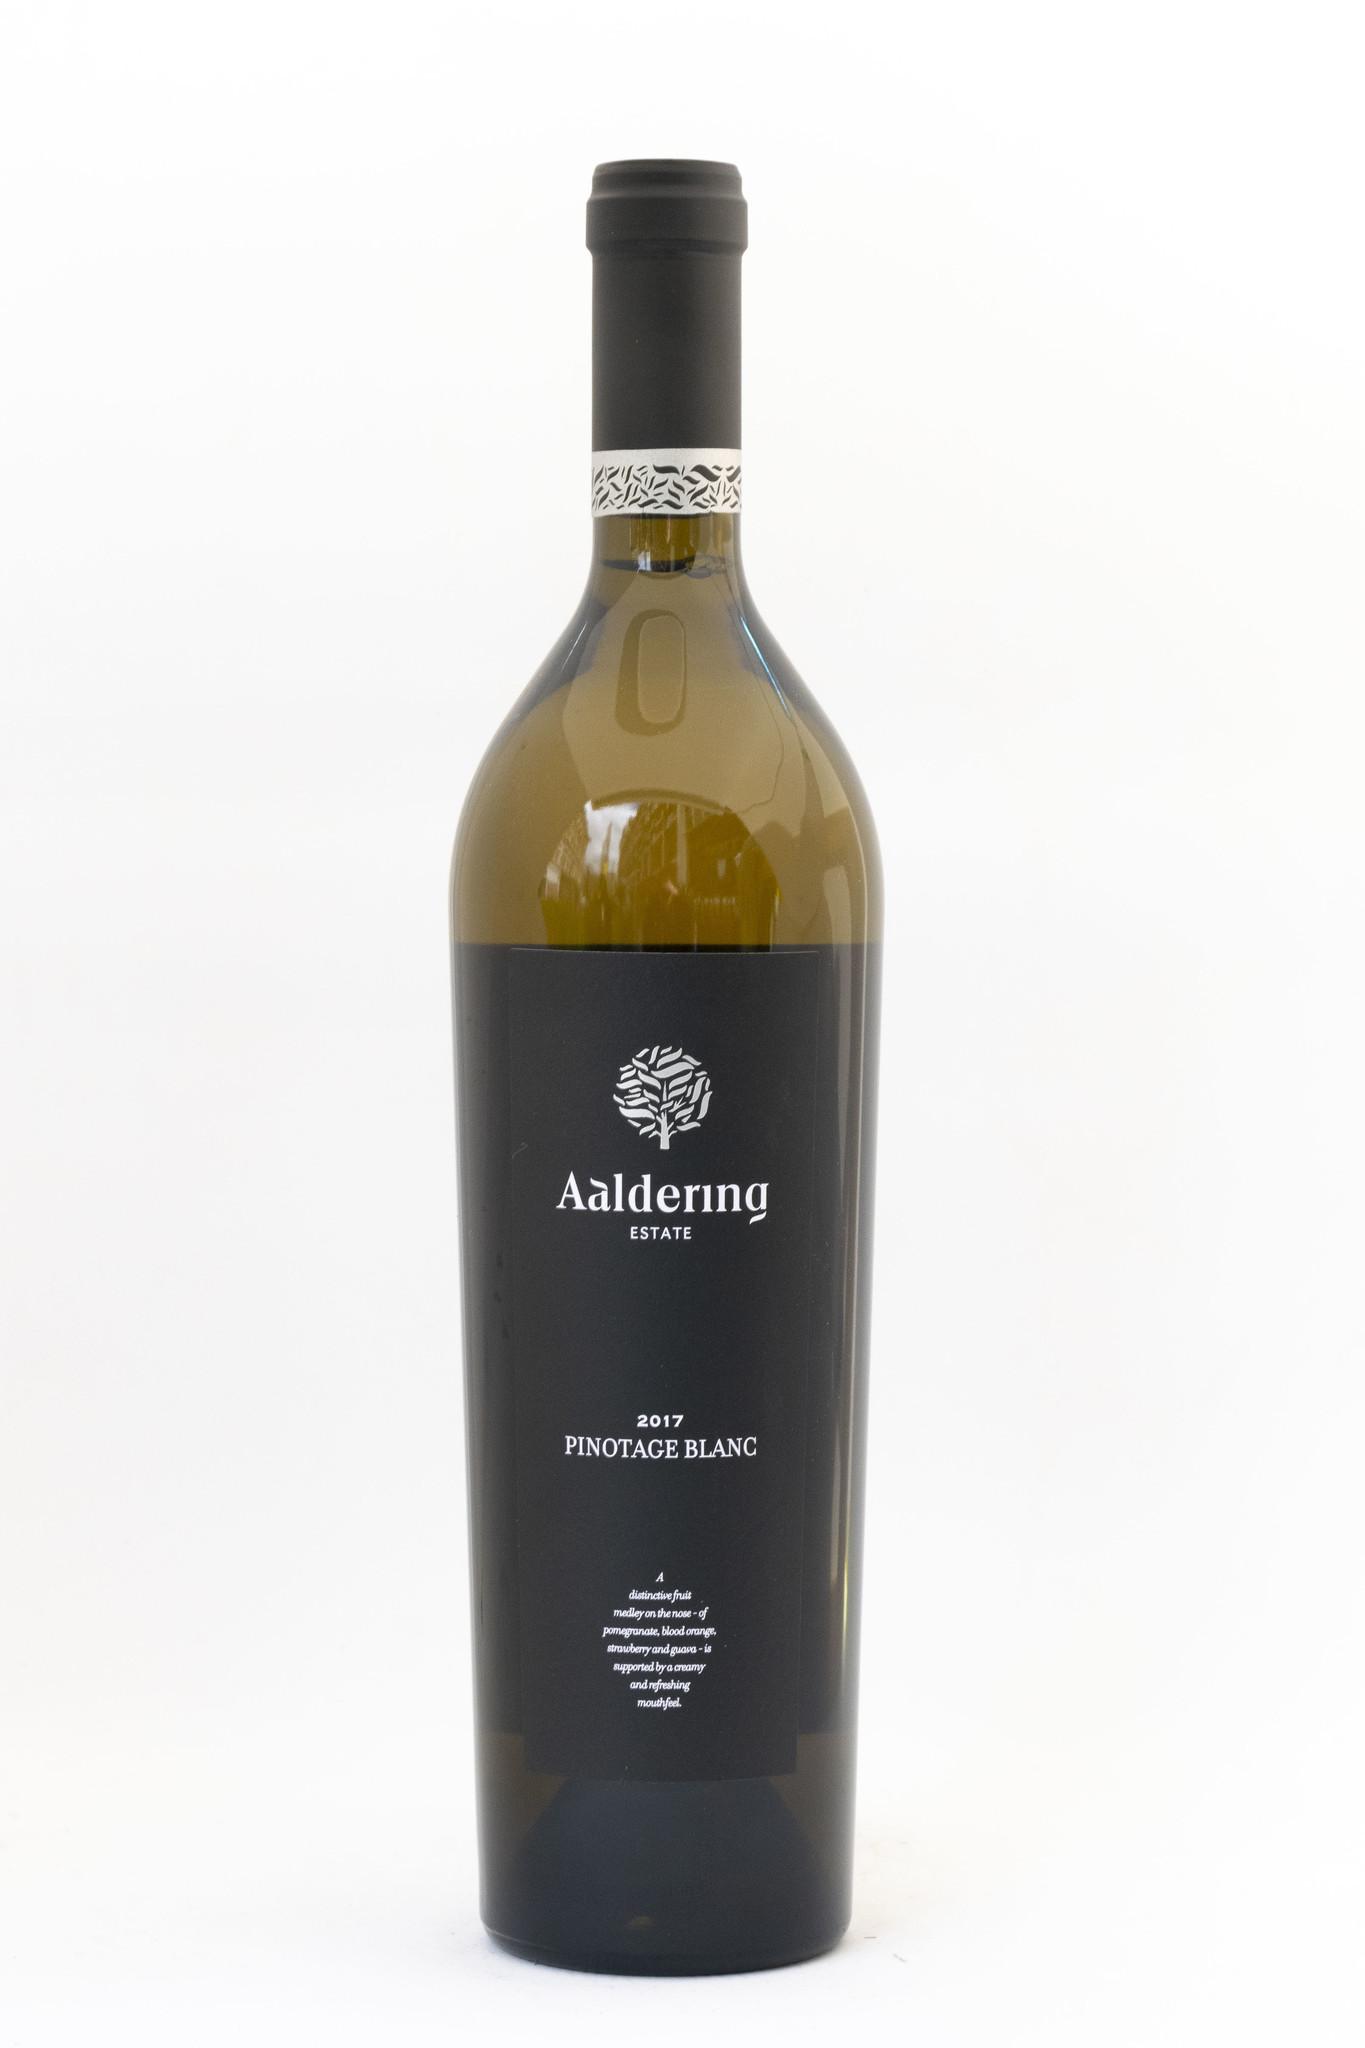 Blanc de Noir  | Aaldering  vinyards & wines |  Pinotage Blanc  | Stellenbosch